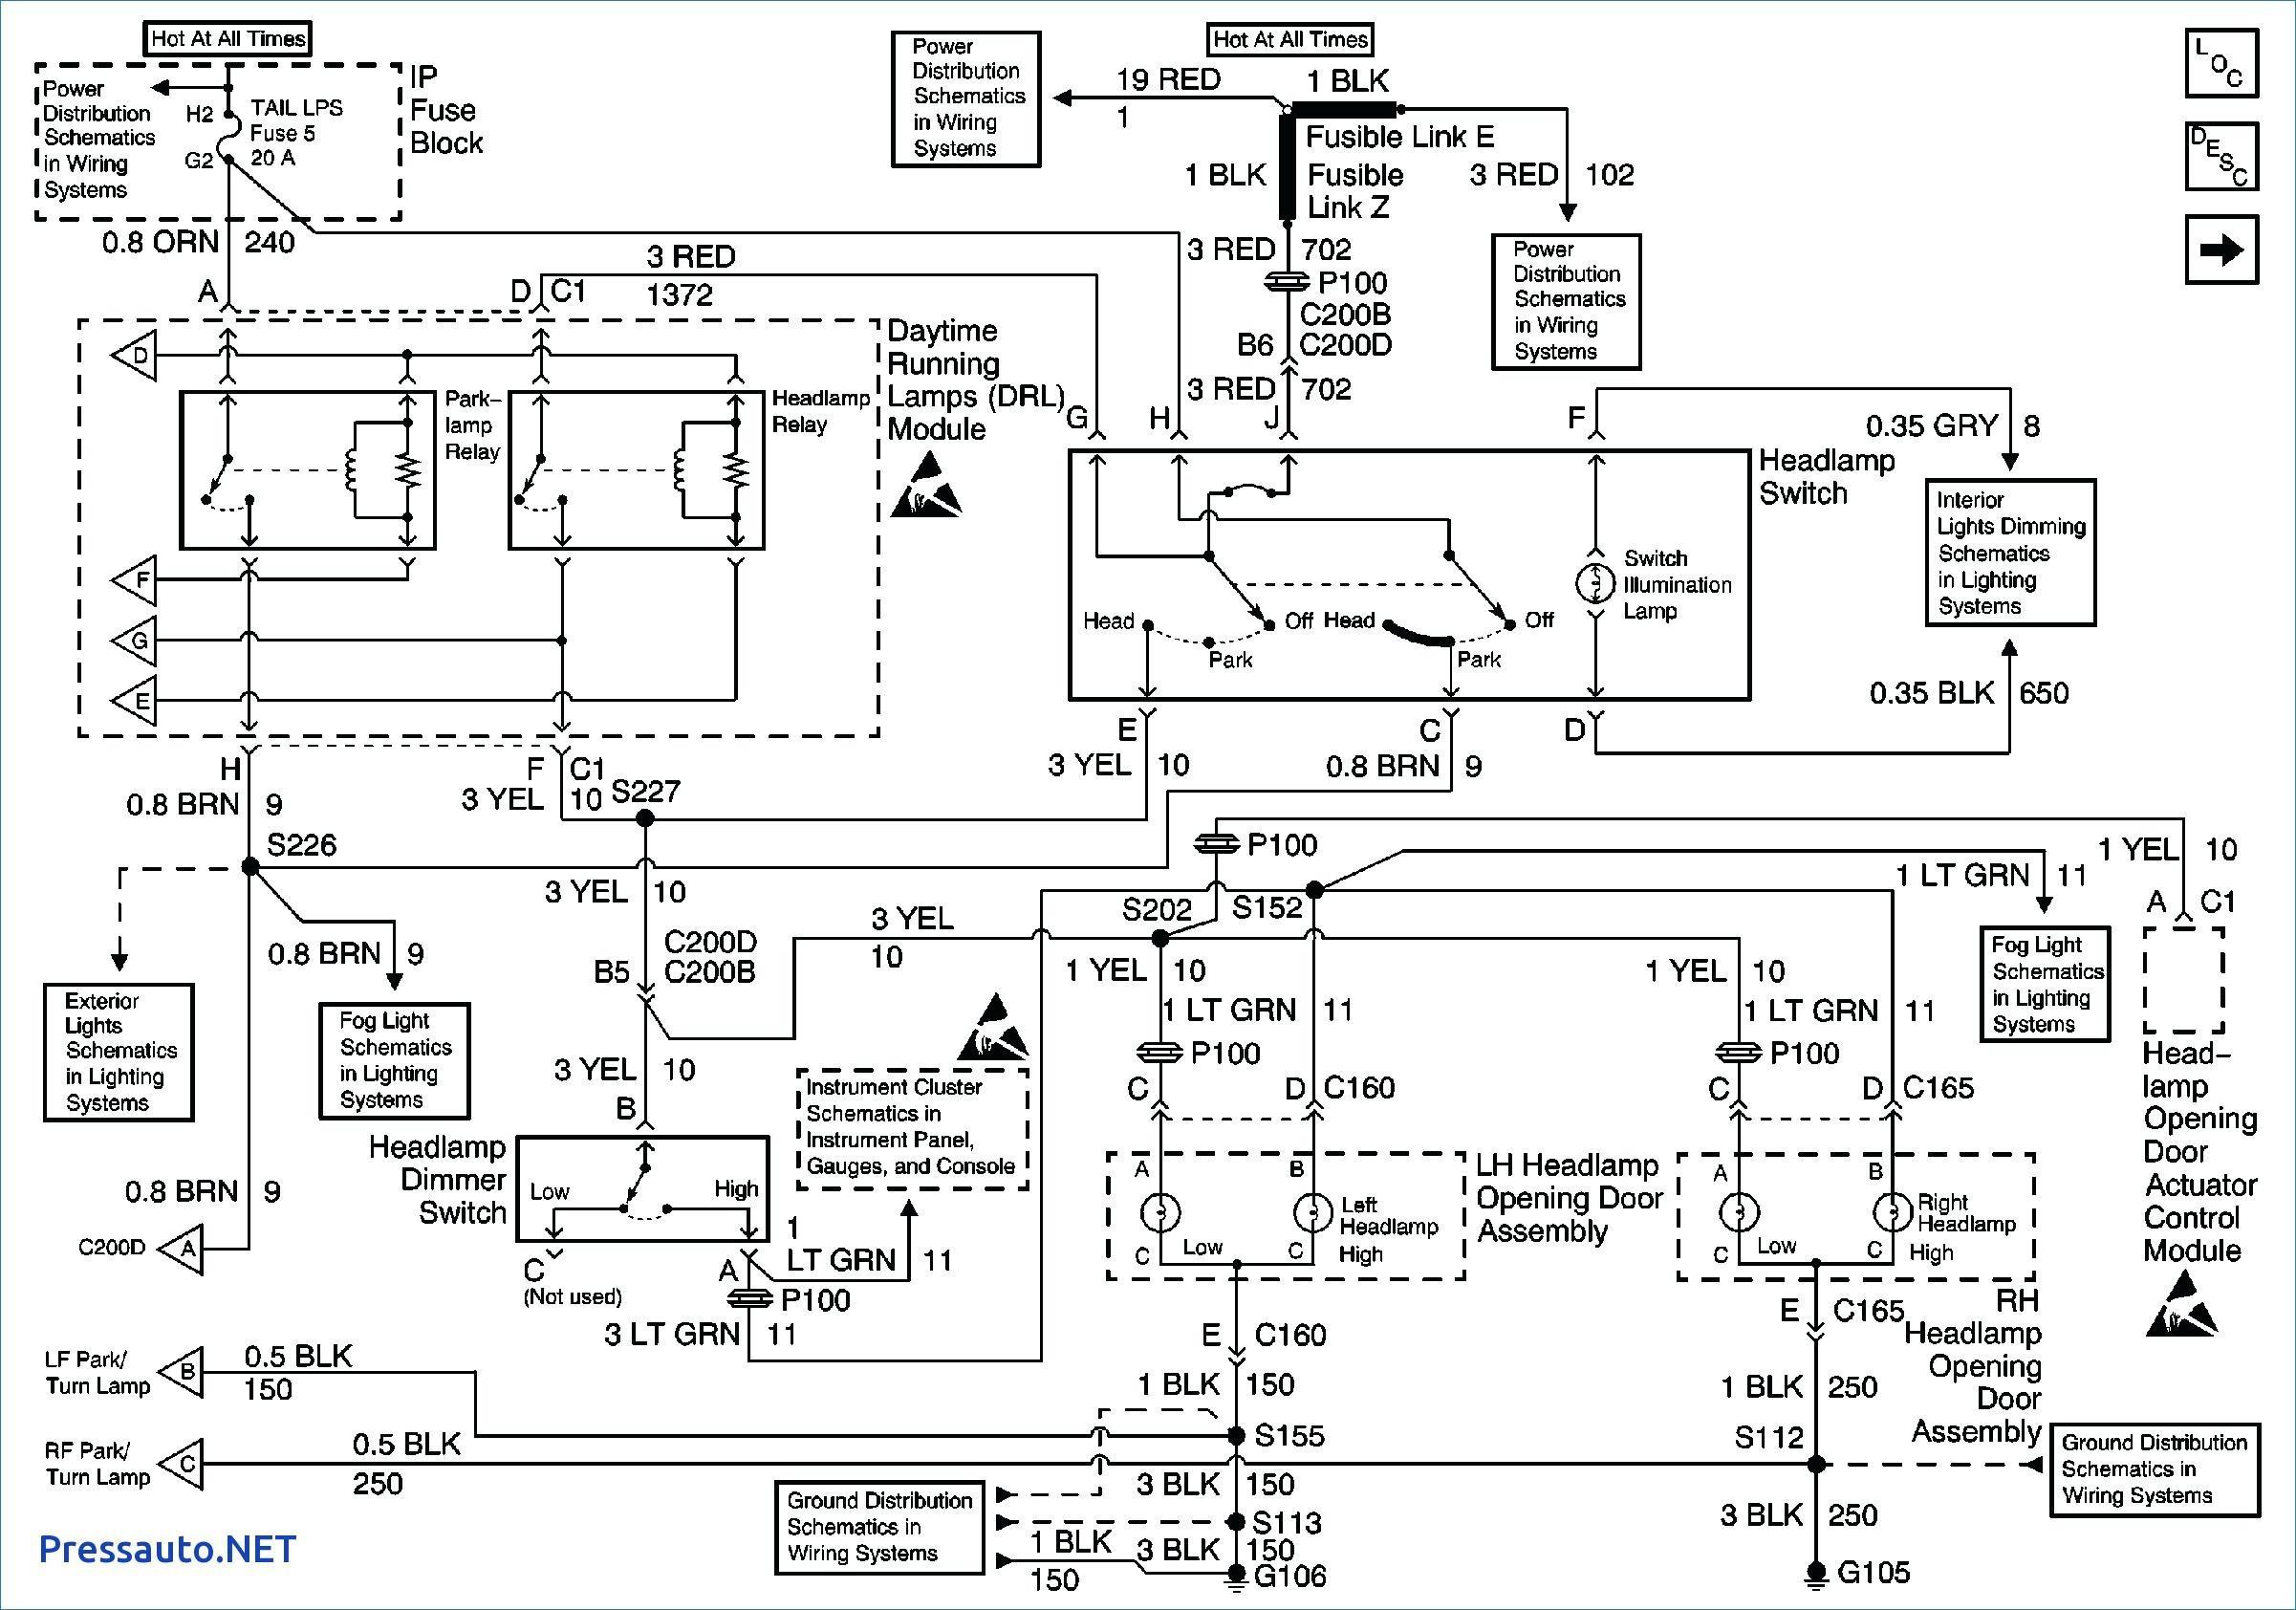 96 honda civic radio wiring diagram new 1996 stereo bright harness in 96 honda civic radio wiring diagram